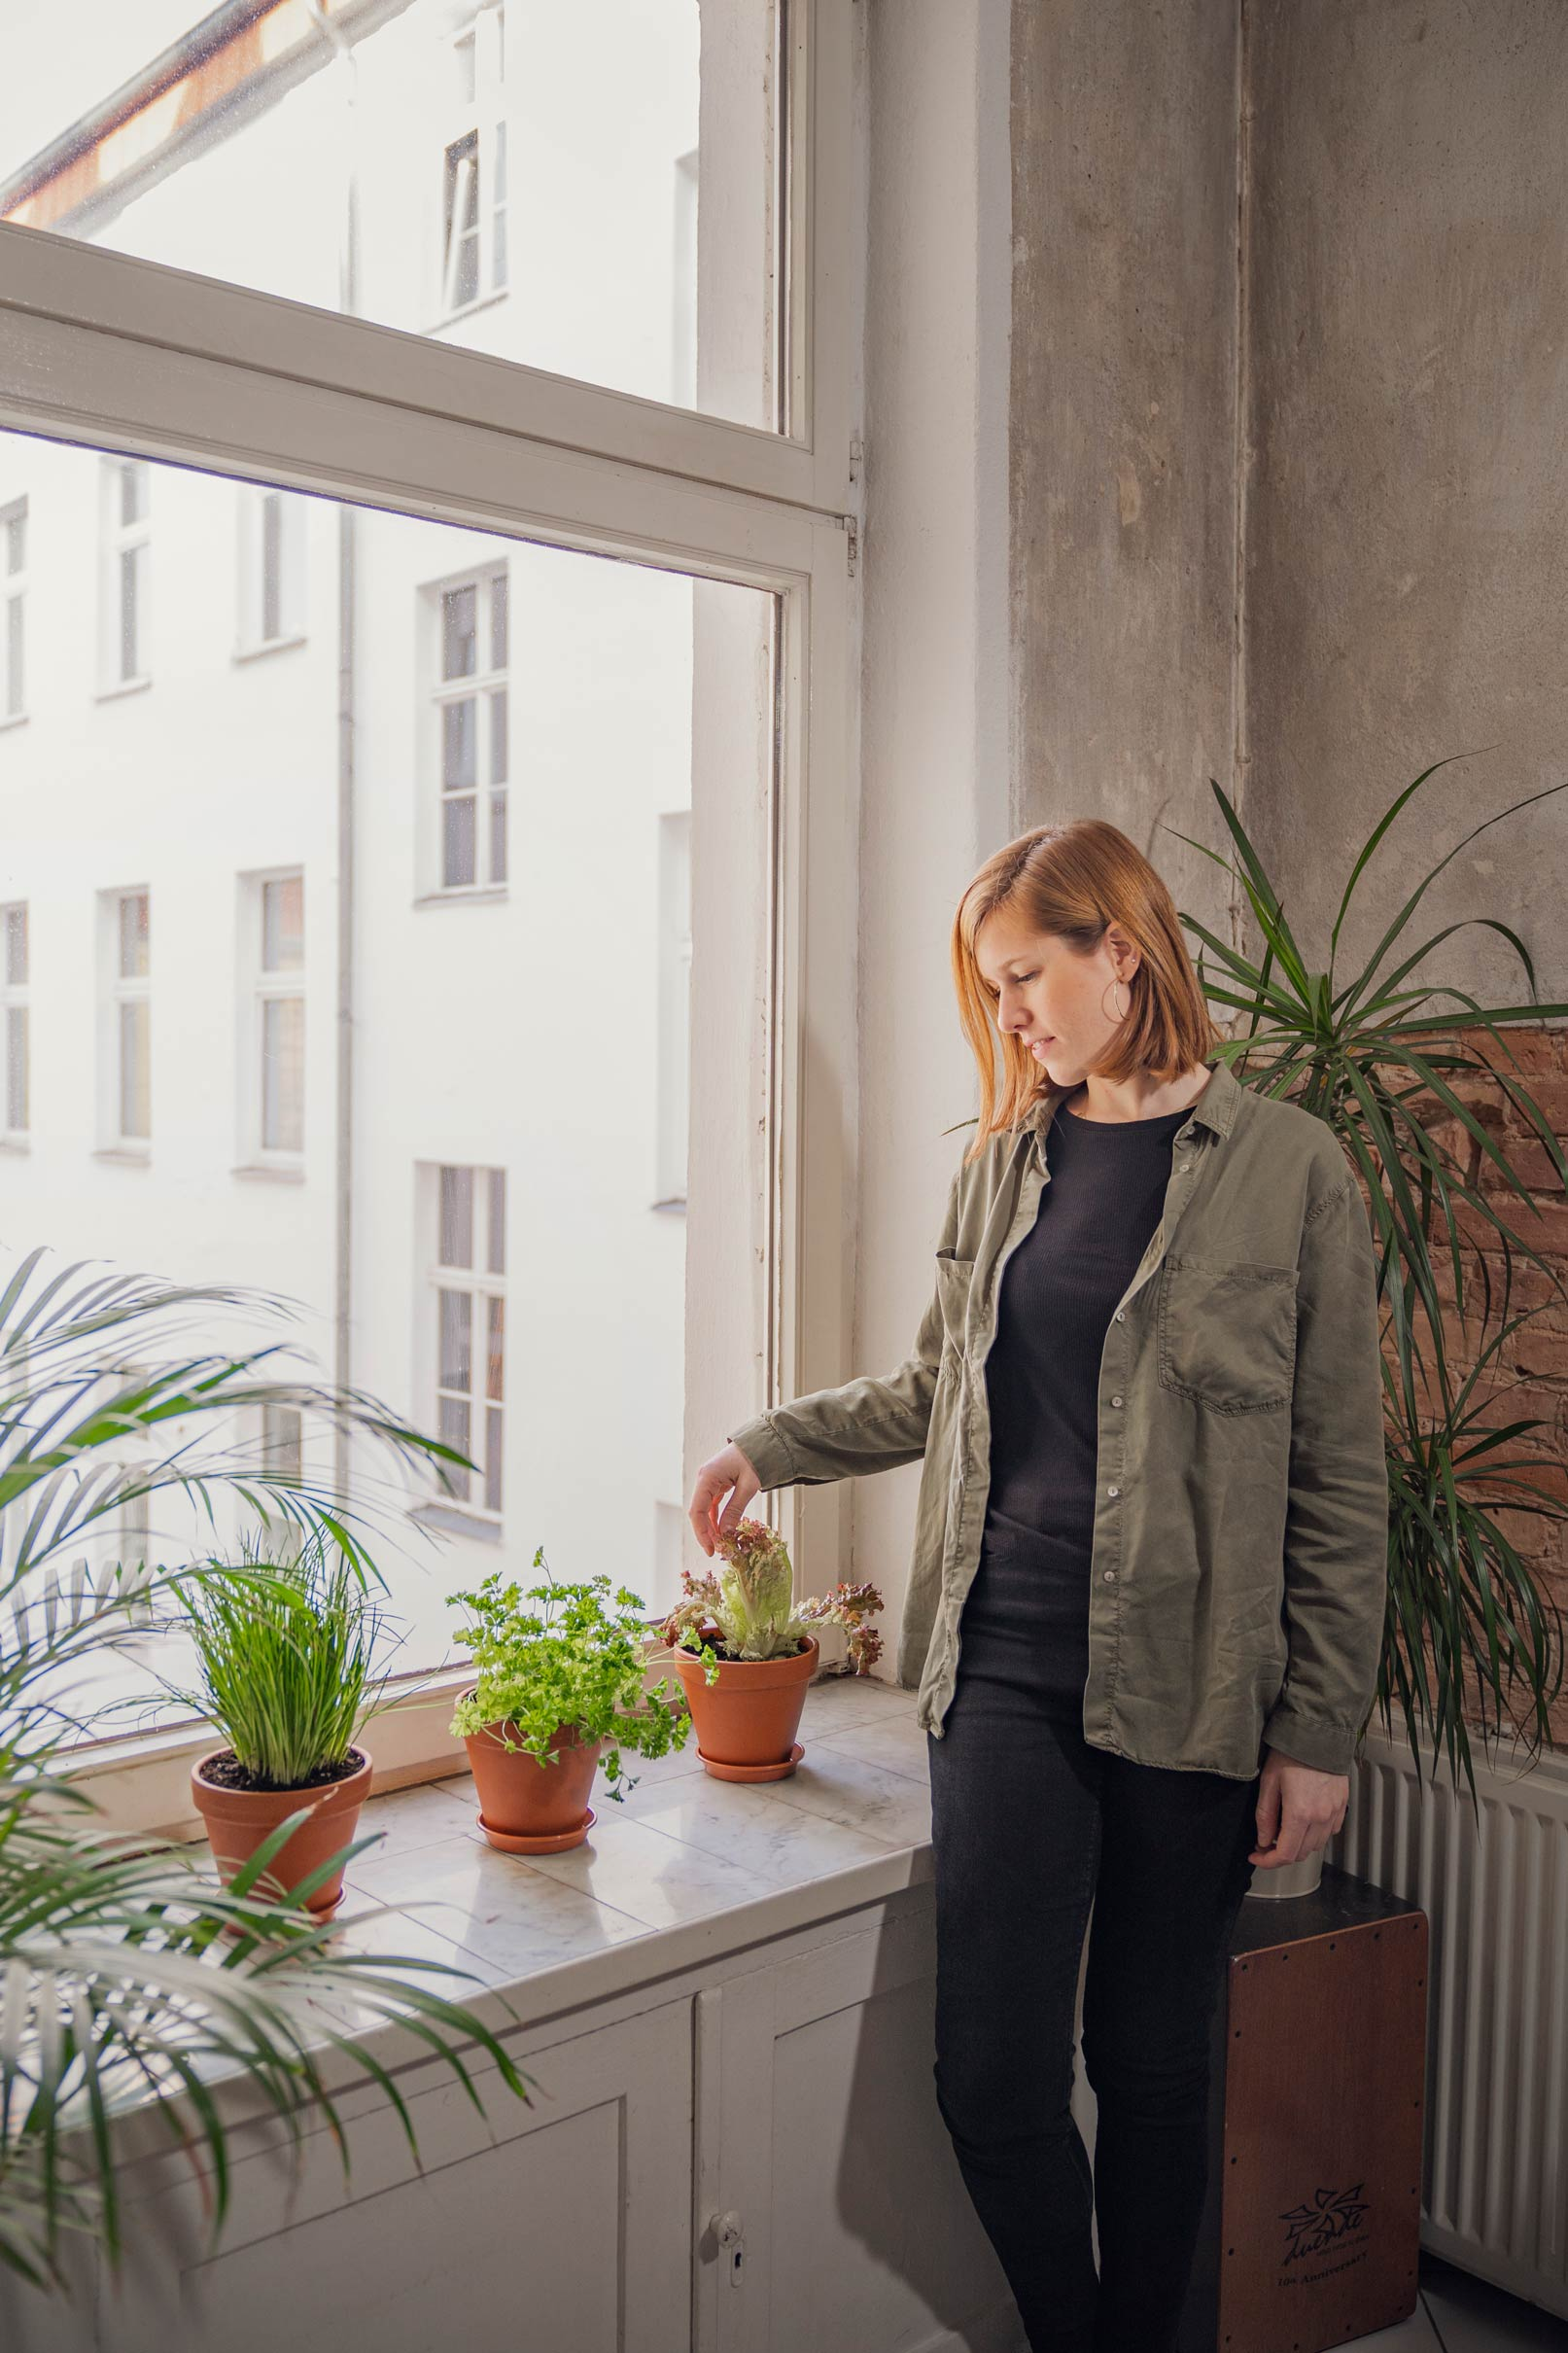 Alicia Ferrer from Grüneo